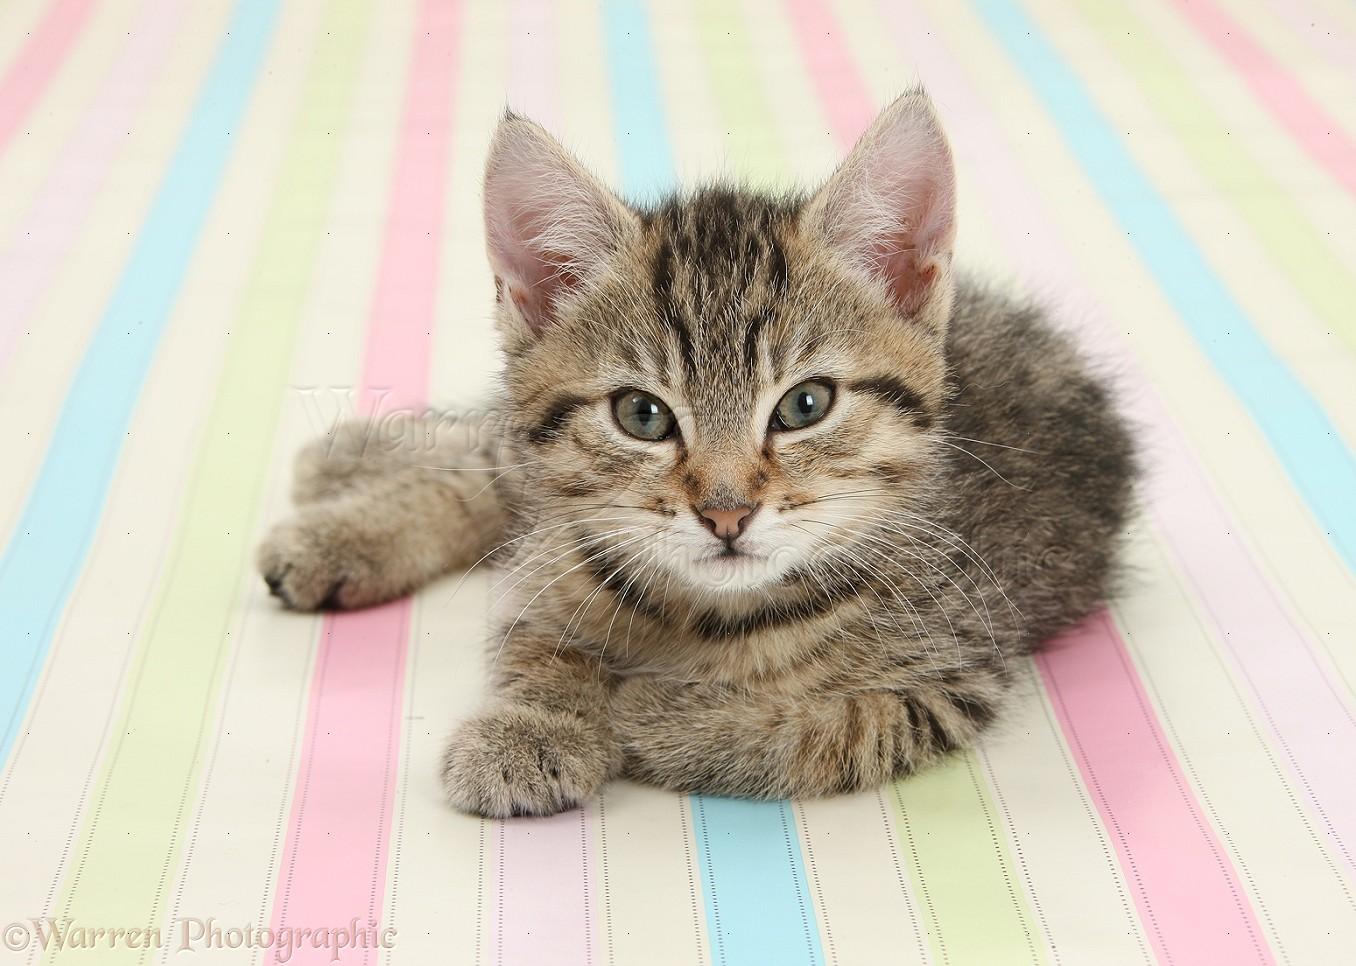 36431 Cute tabby kitten sitting on stripy background